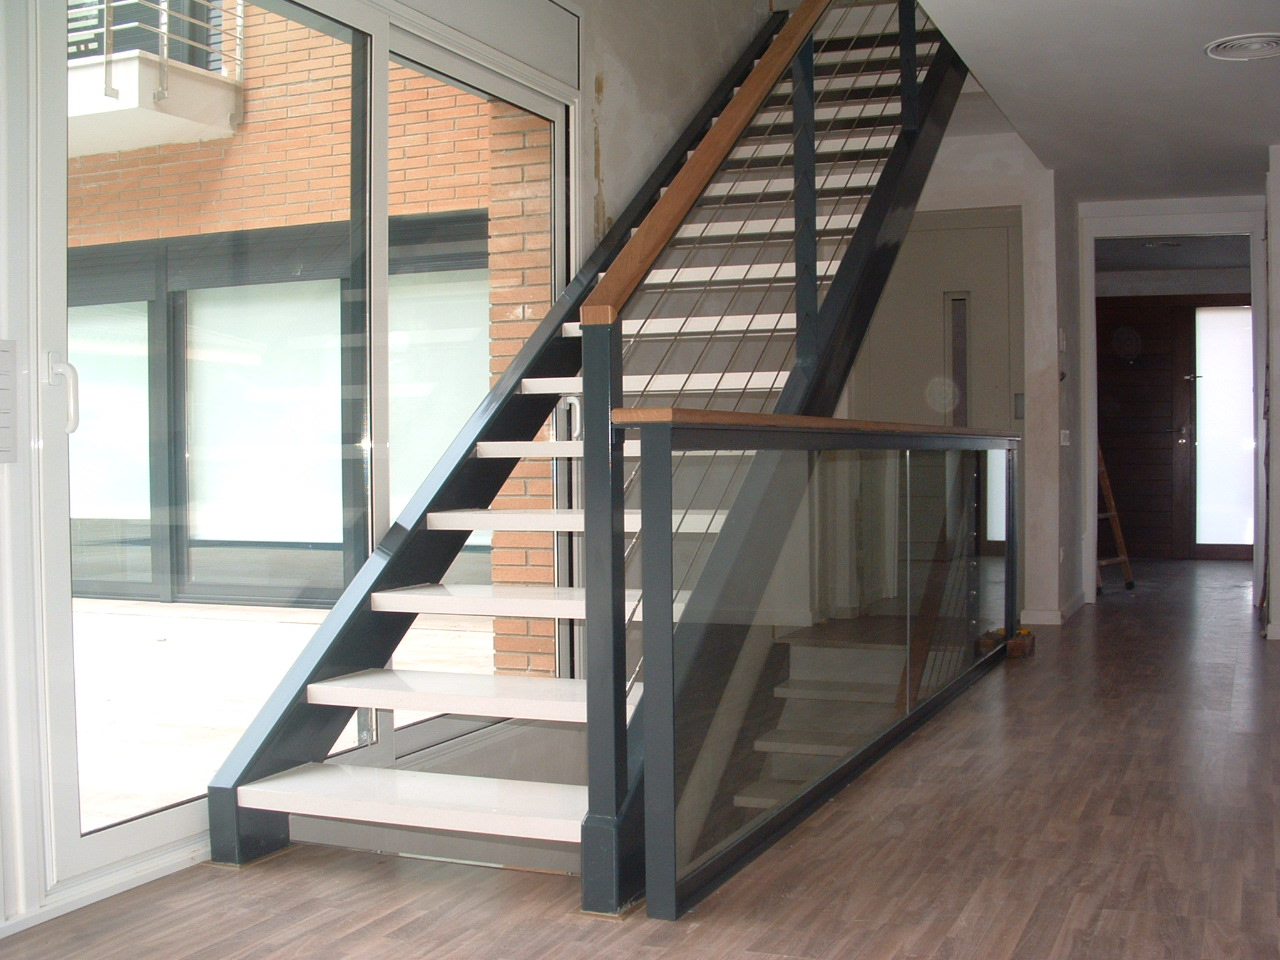 Jl padial cerrajer a de dise o escaleras y barandas - Escalera de diseno ...